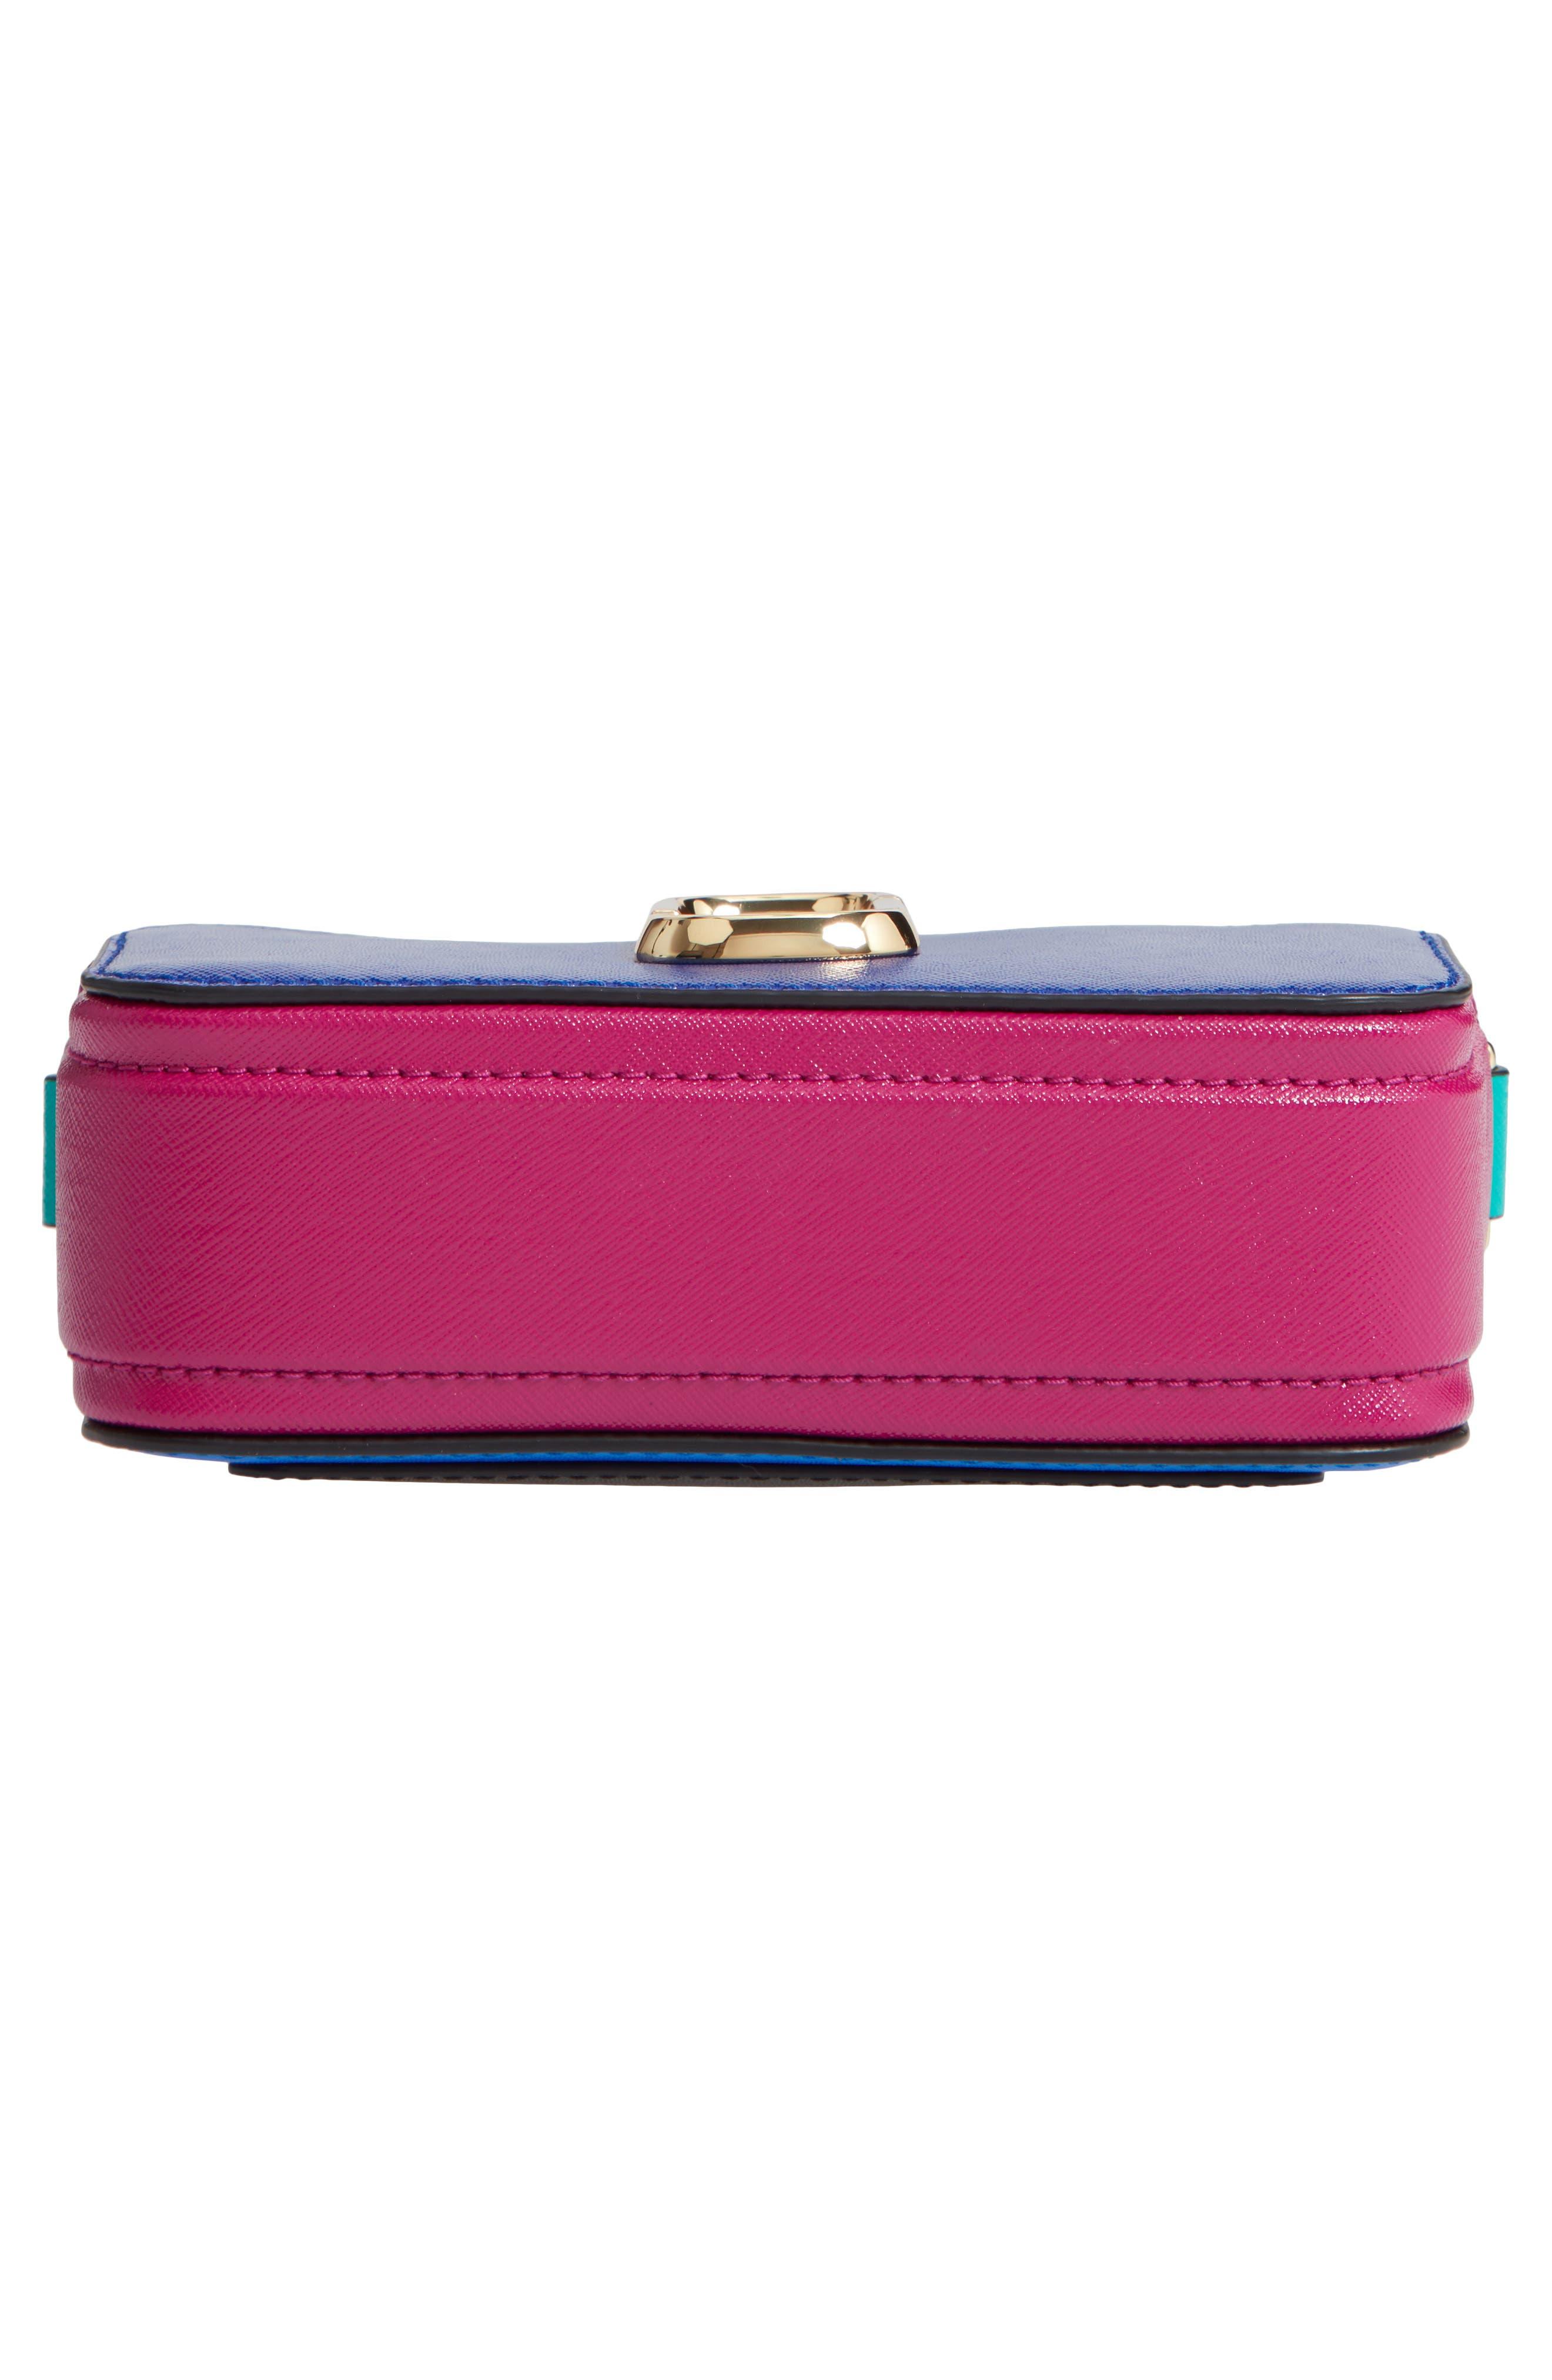 Snapshot Crossbody Bag,                             Alternate thumbnail 4, color,                             Academy Blue Multi